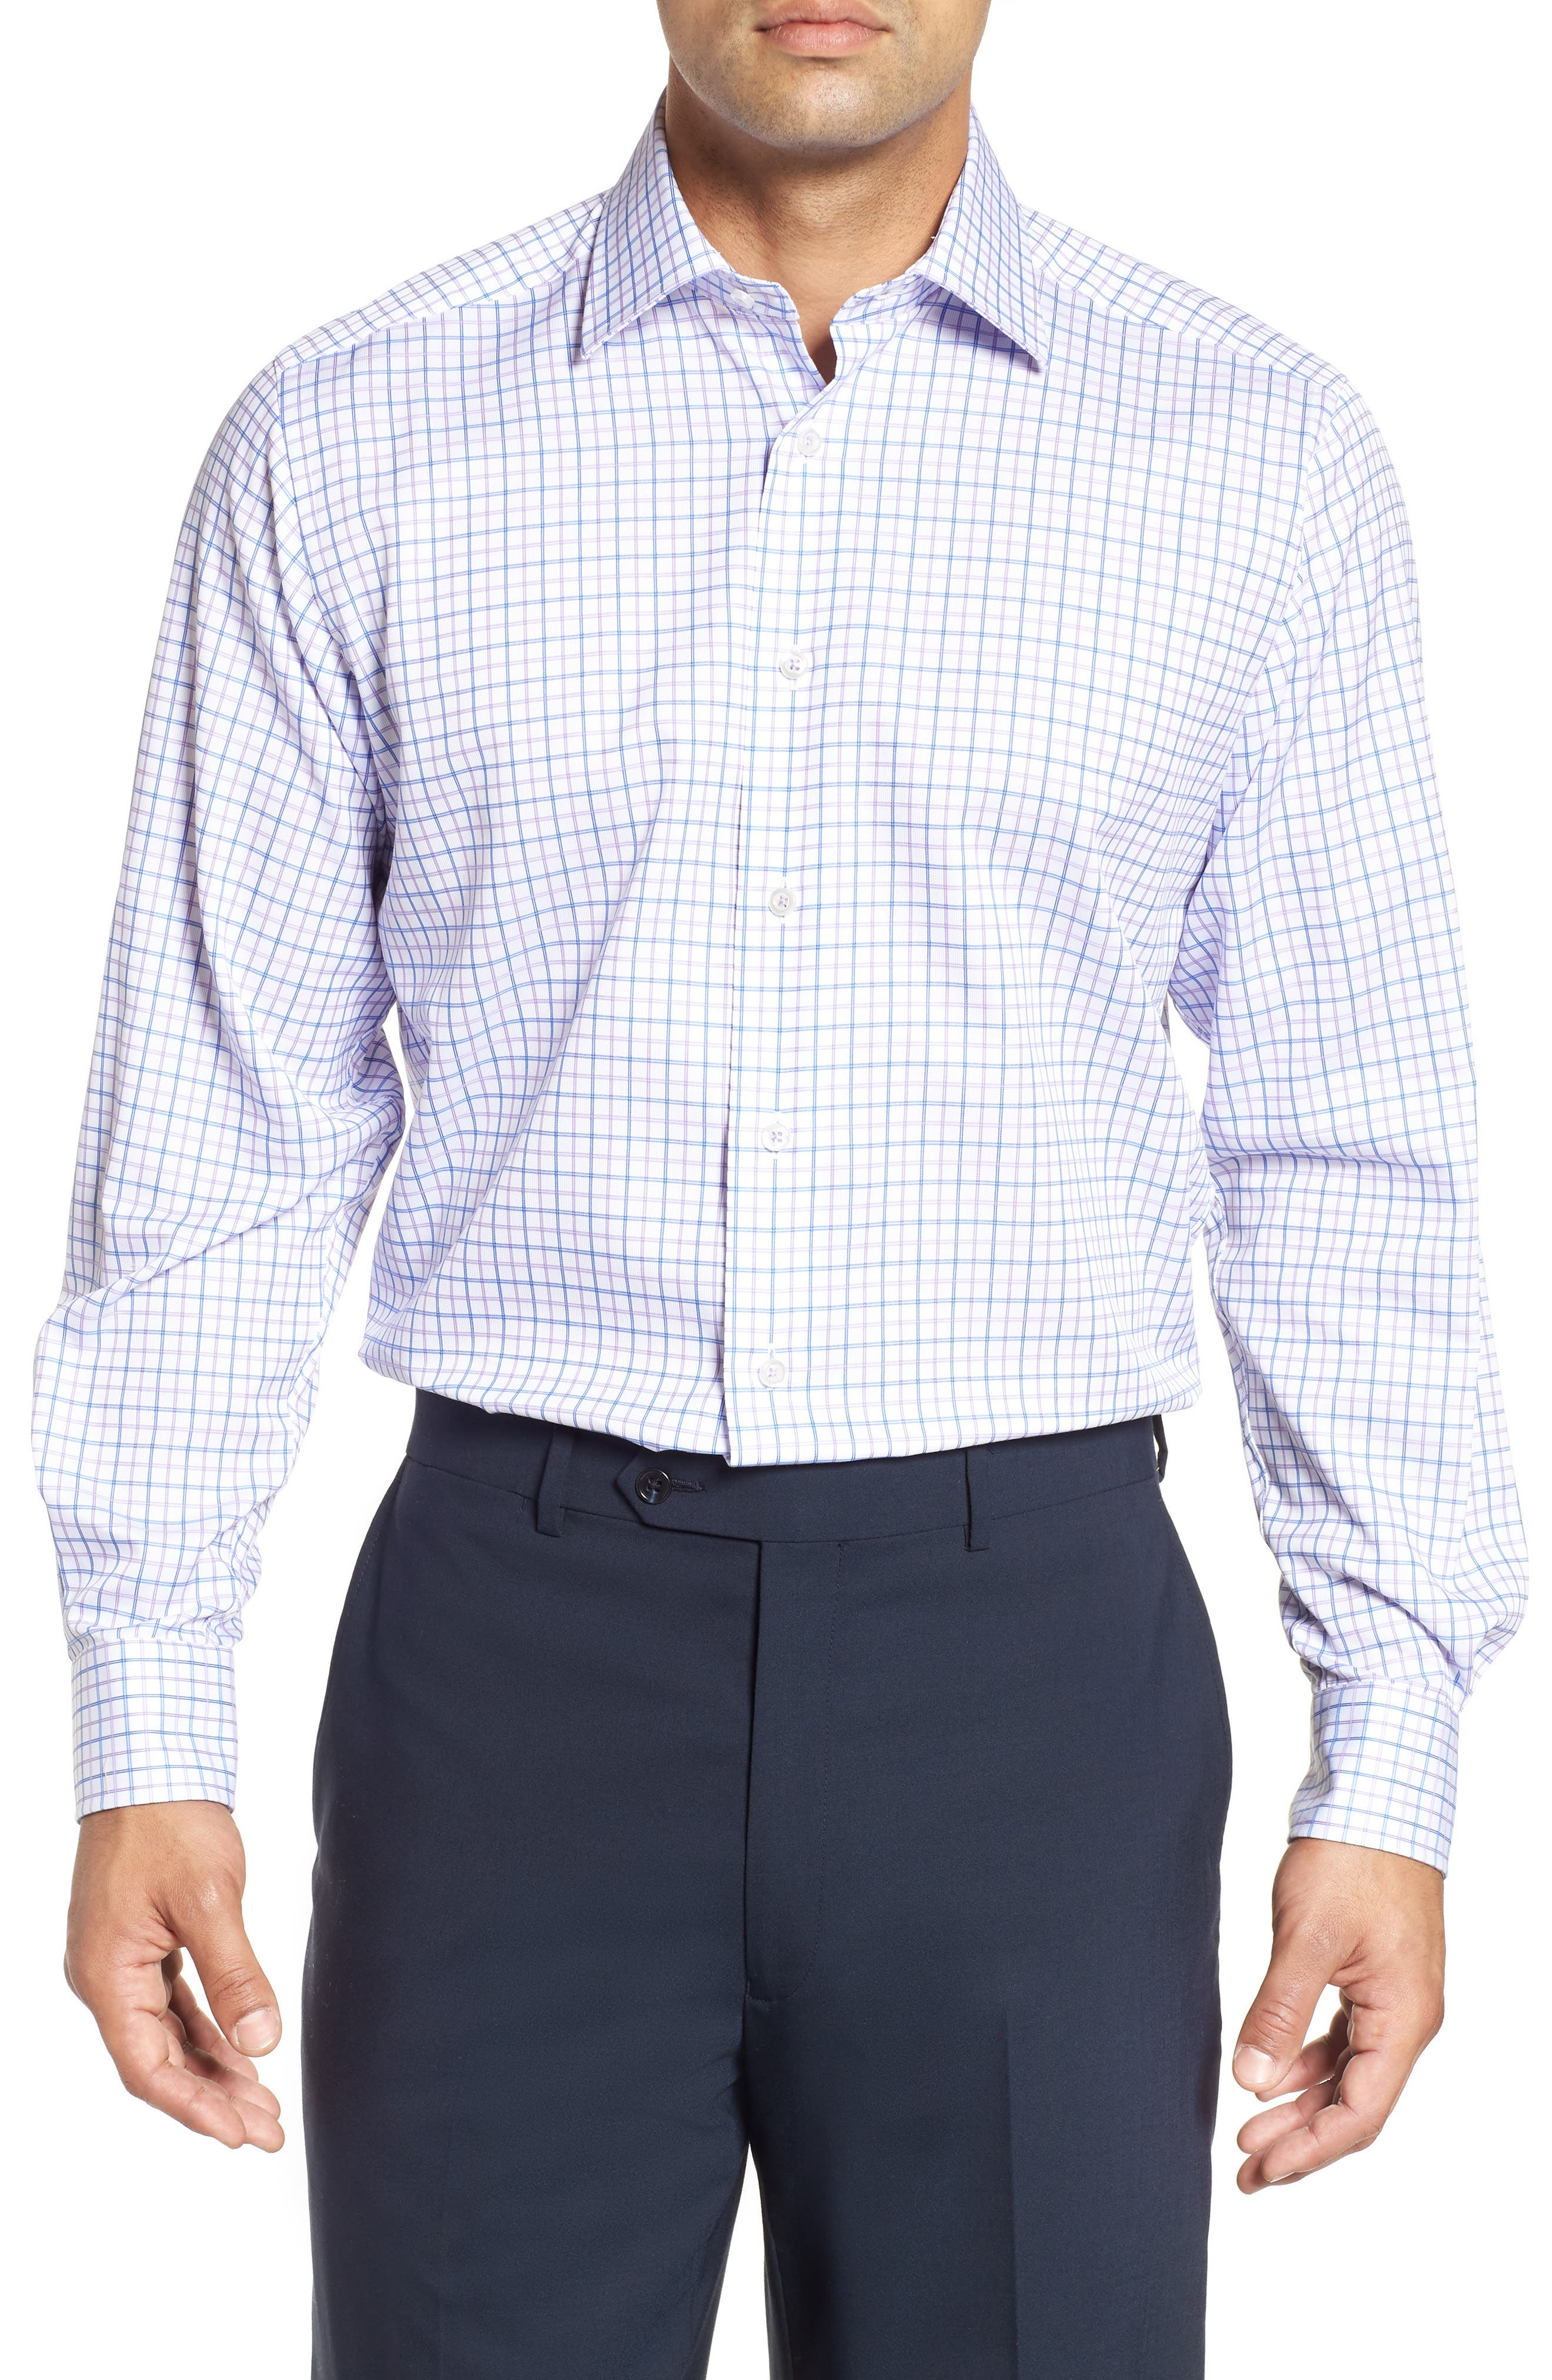 Regular Fit Check Dress Shirt,                         Main,                         color, 534